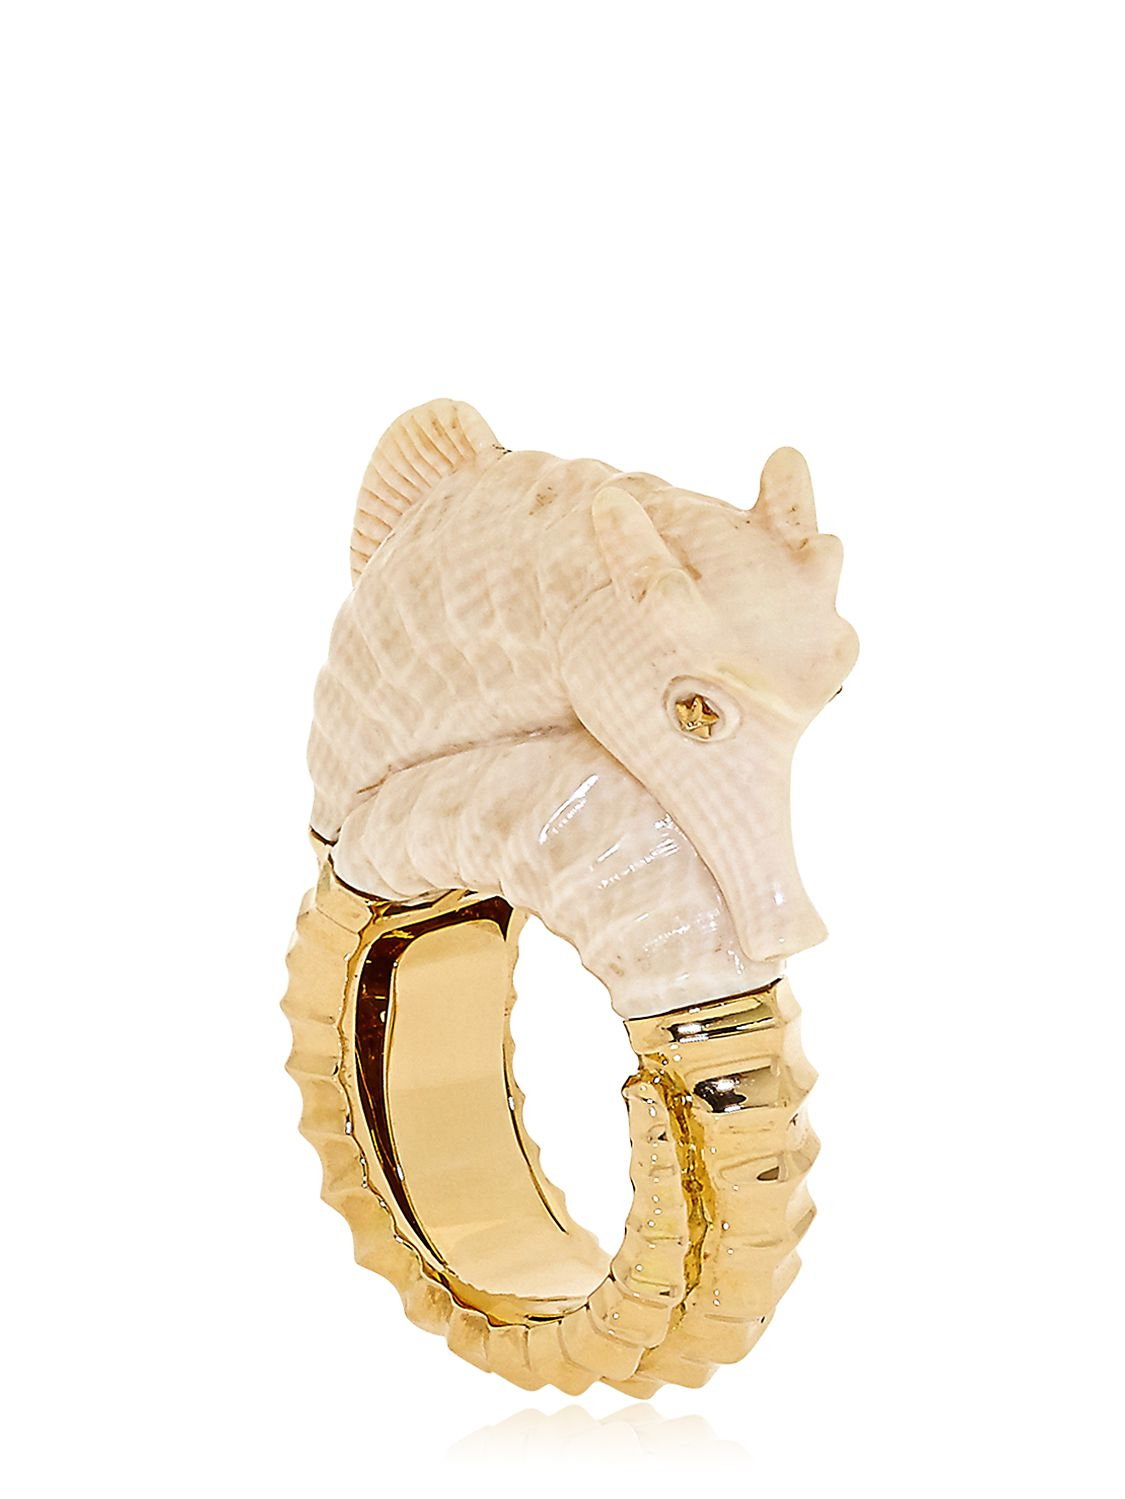 Bibi Van Der Velden Seahorse Ring in White/Gold (Natural)